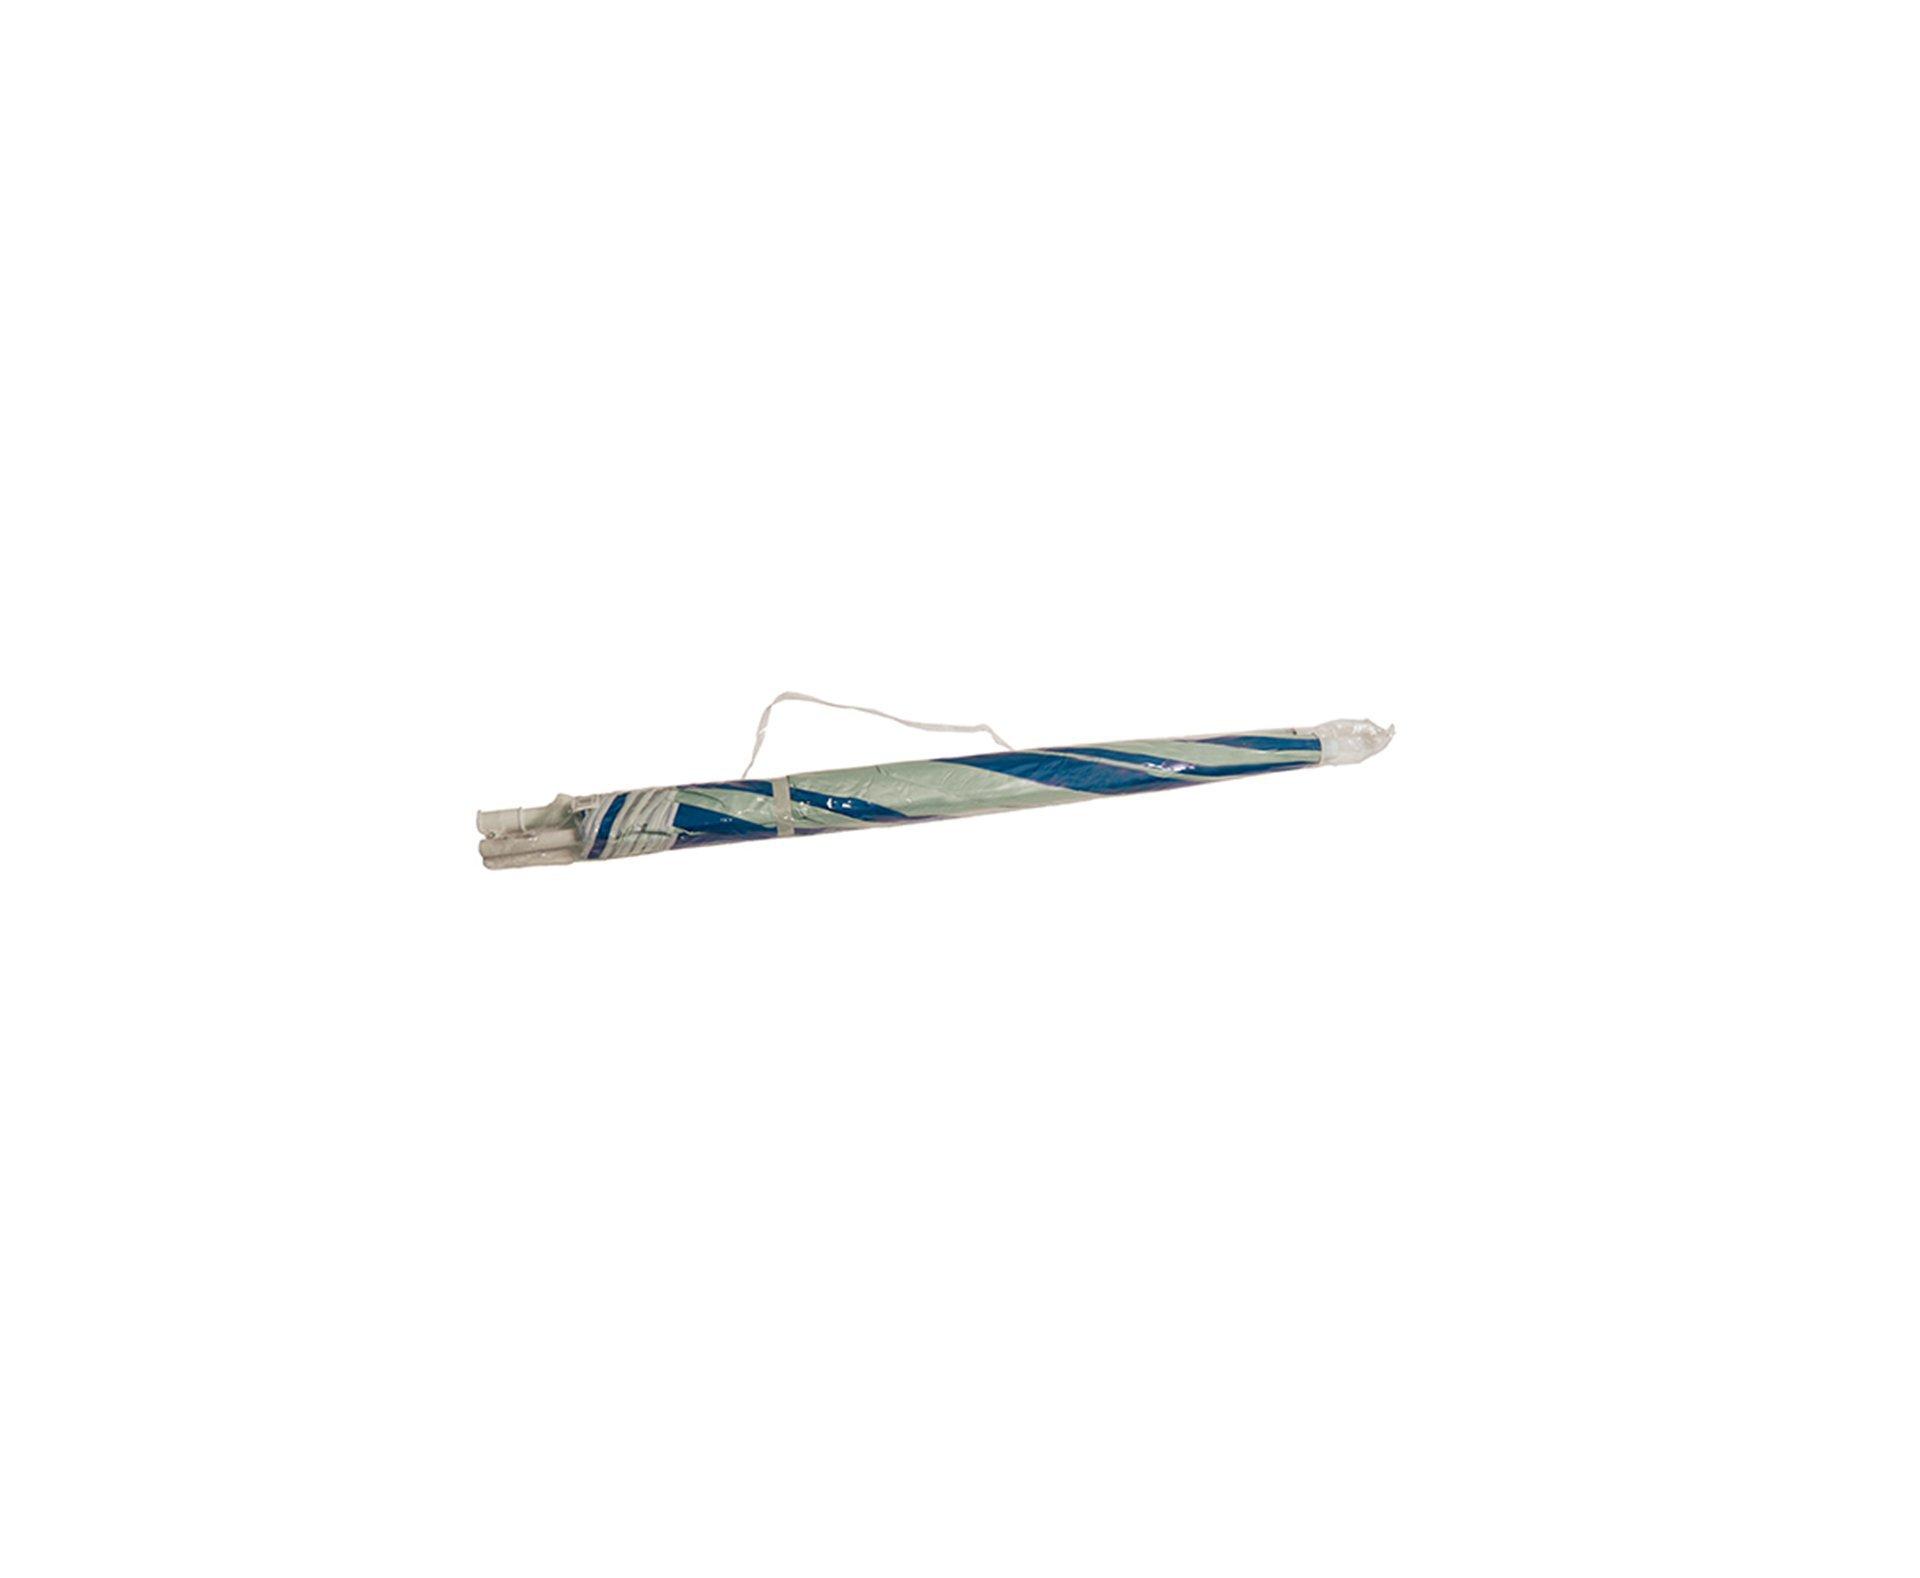 Guarda Sol 1,8m Com Silver Coating Azul Praia E Piscina Mor Fps 70